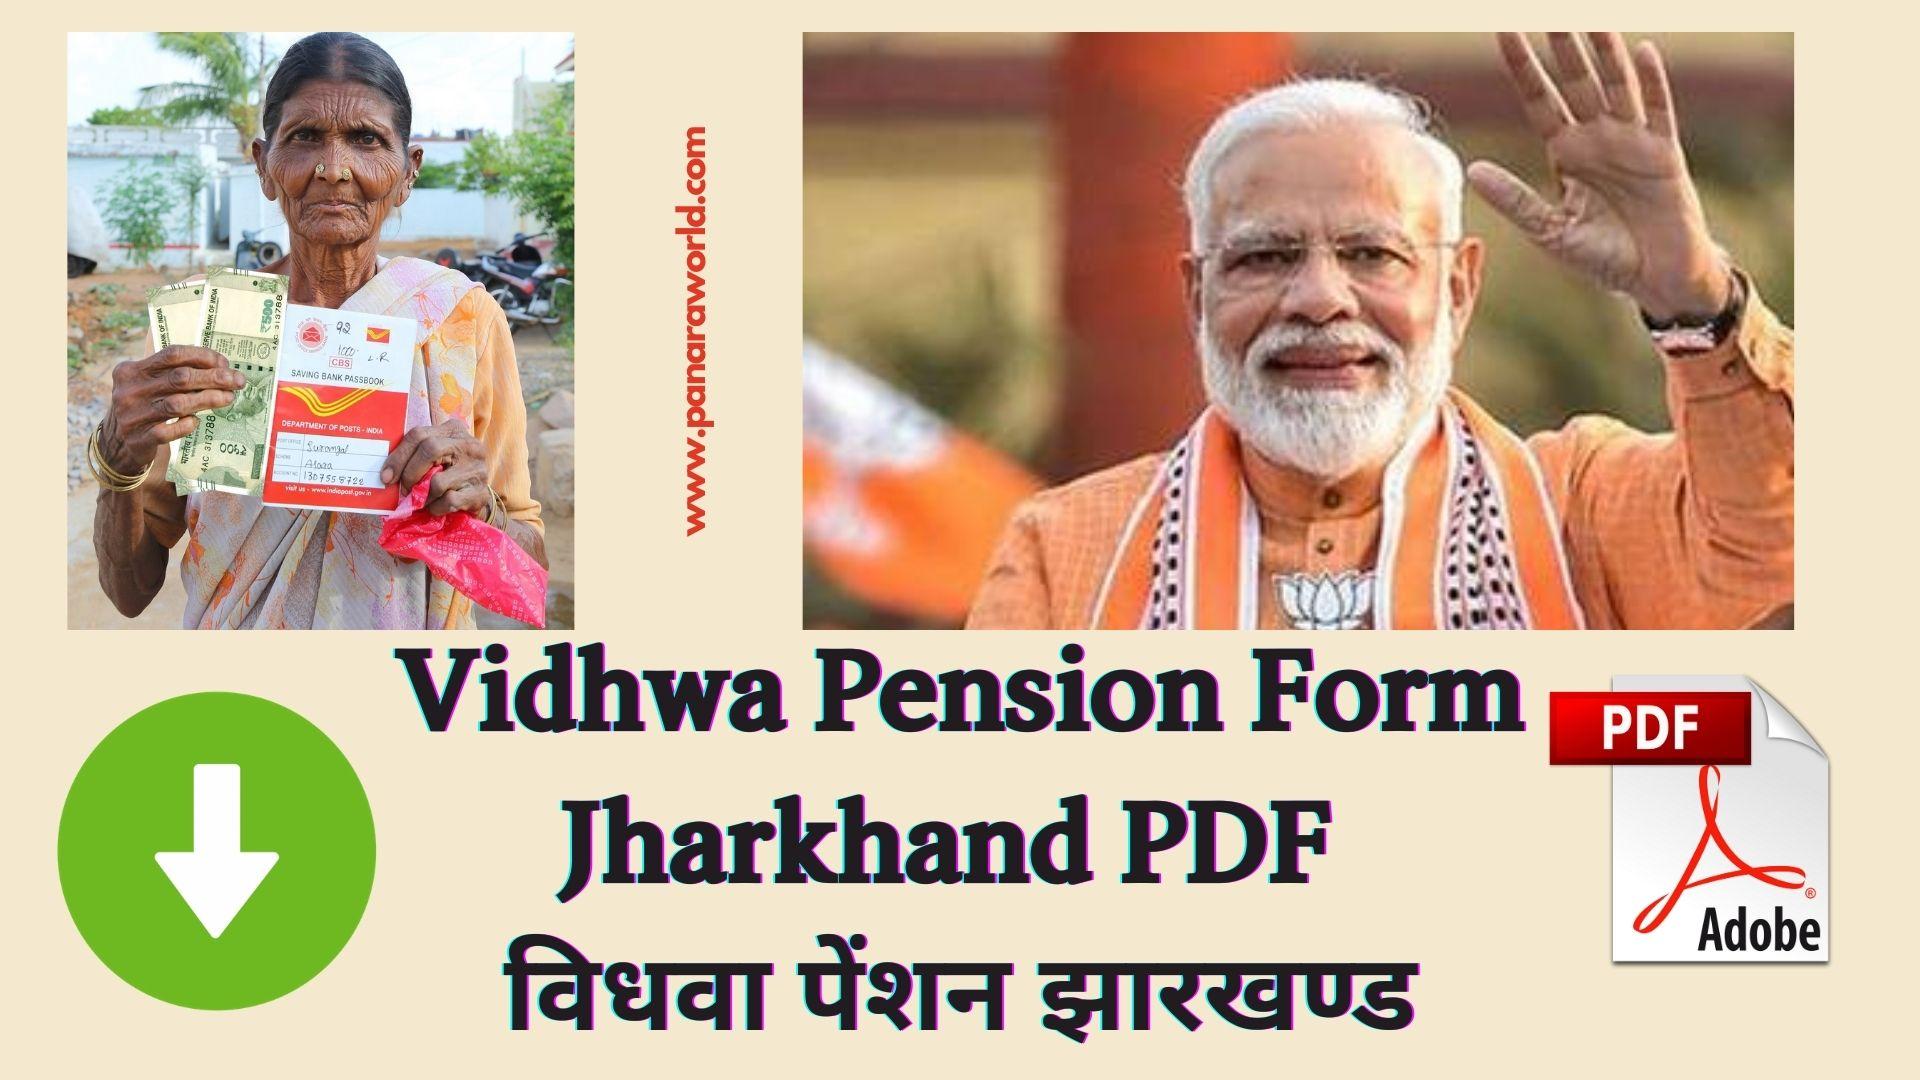 Vidhwa Pension Form Jharkhand PDF विधवा पेंशन झारखण्ड